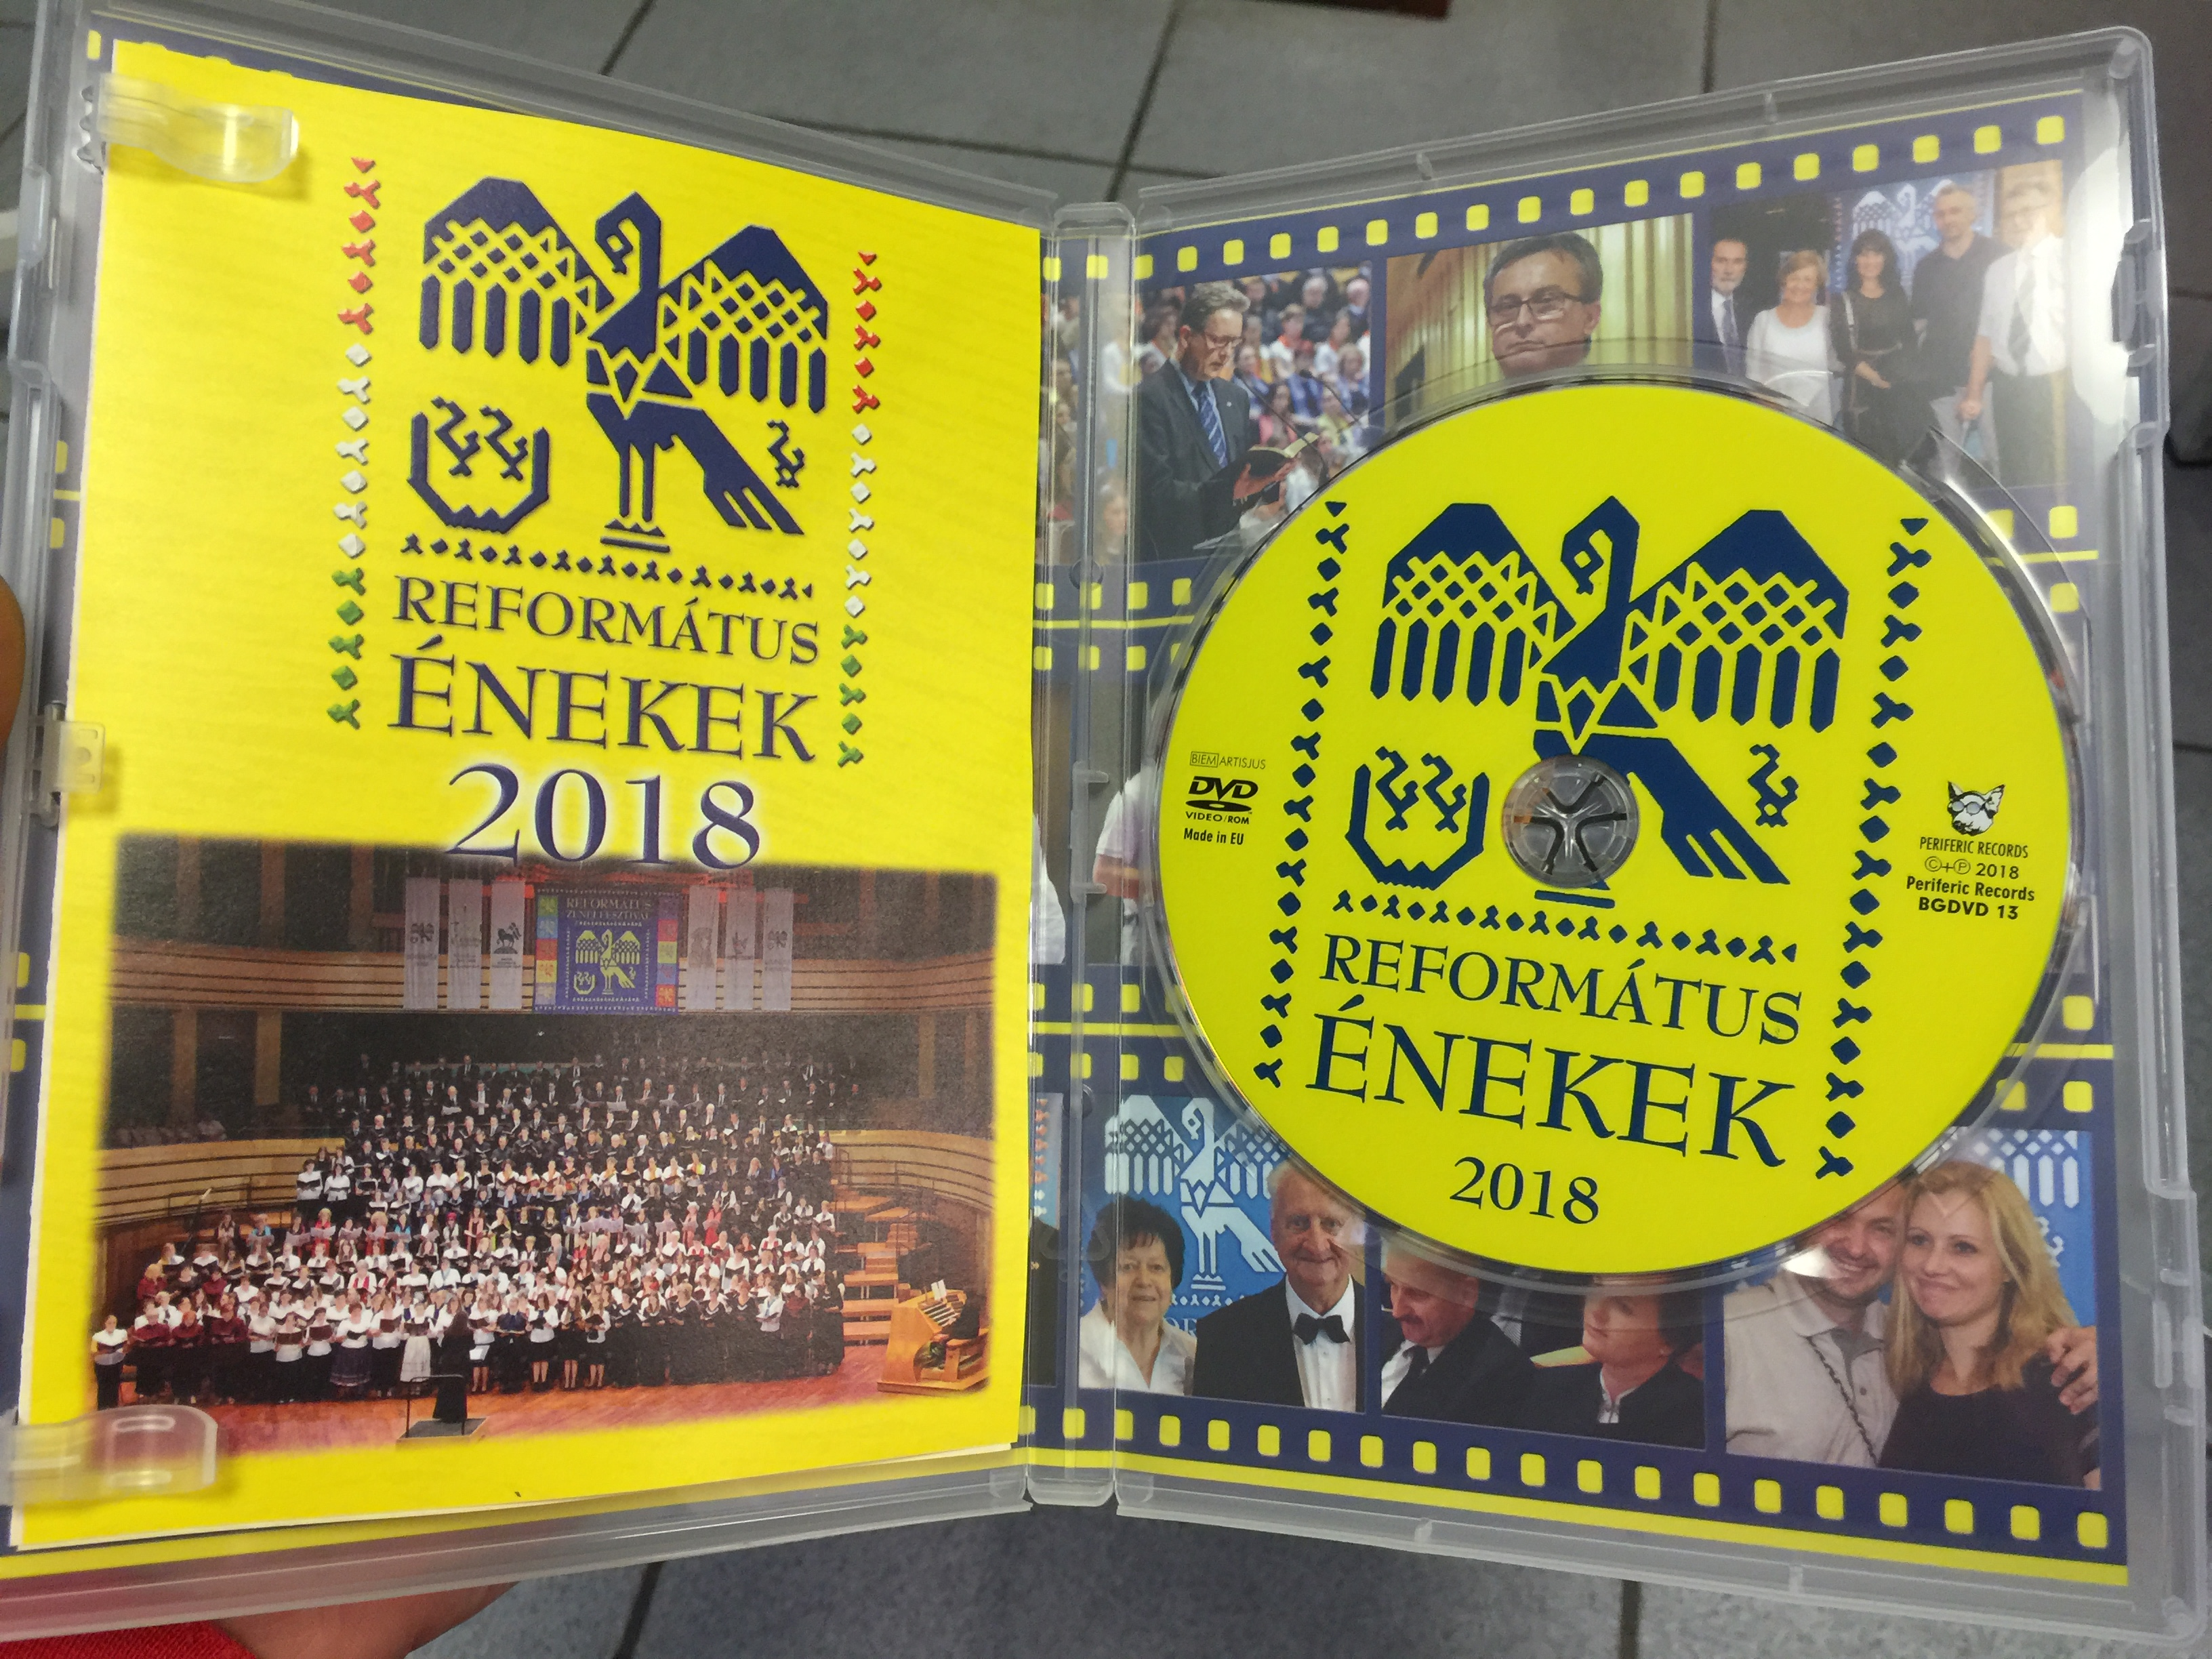 reform-tus-nekek-dvd-2018-hymns-of-the-reformed-church-2018-3.jpg